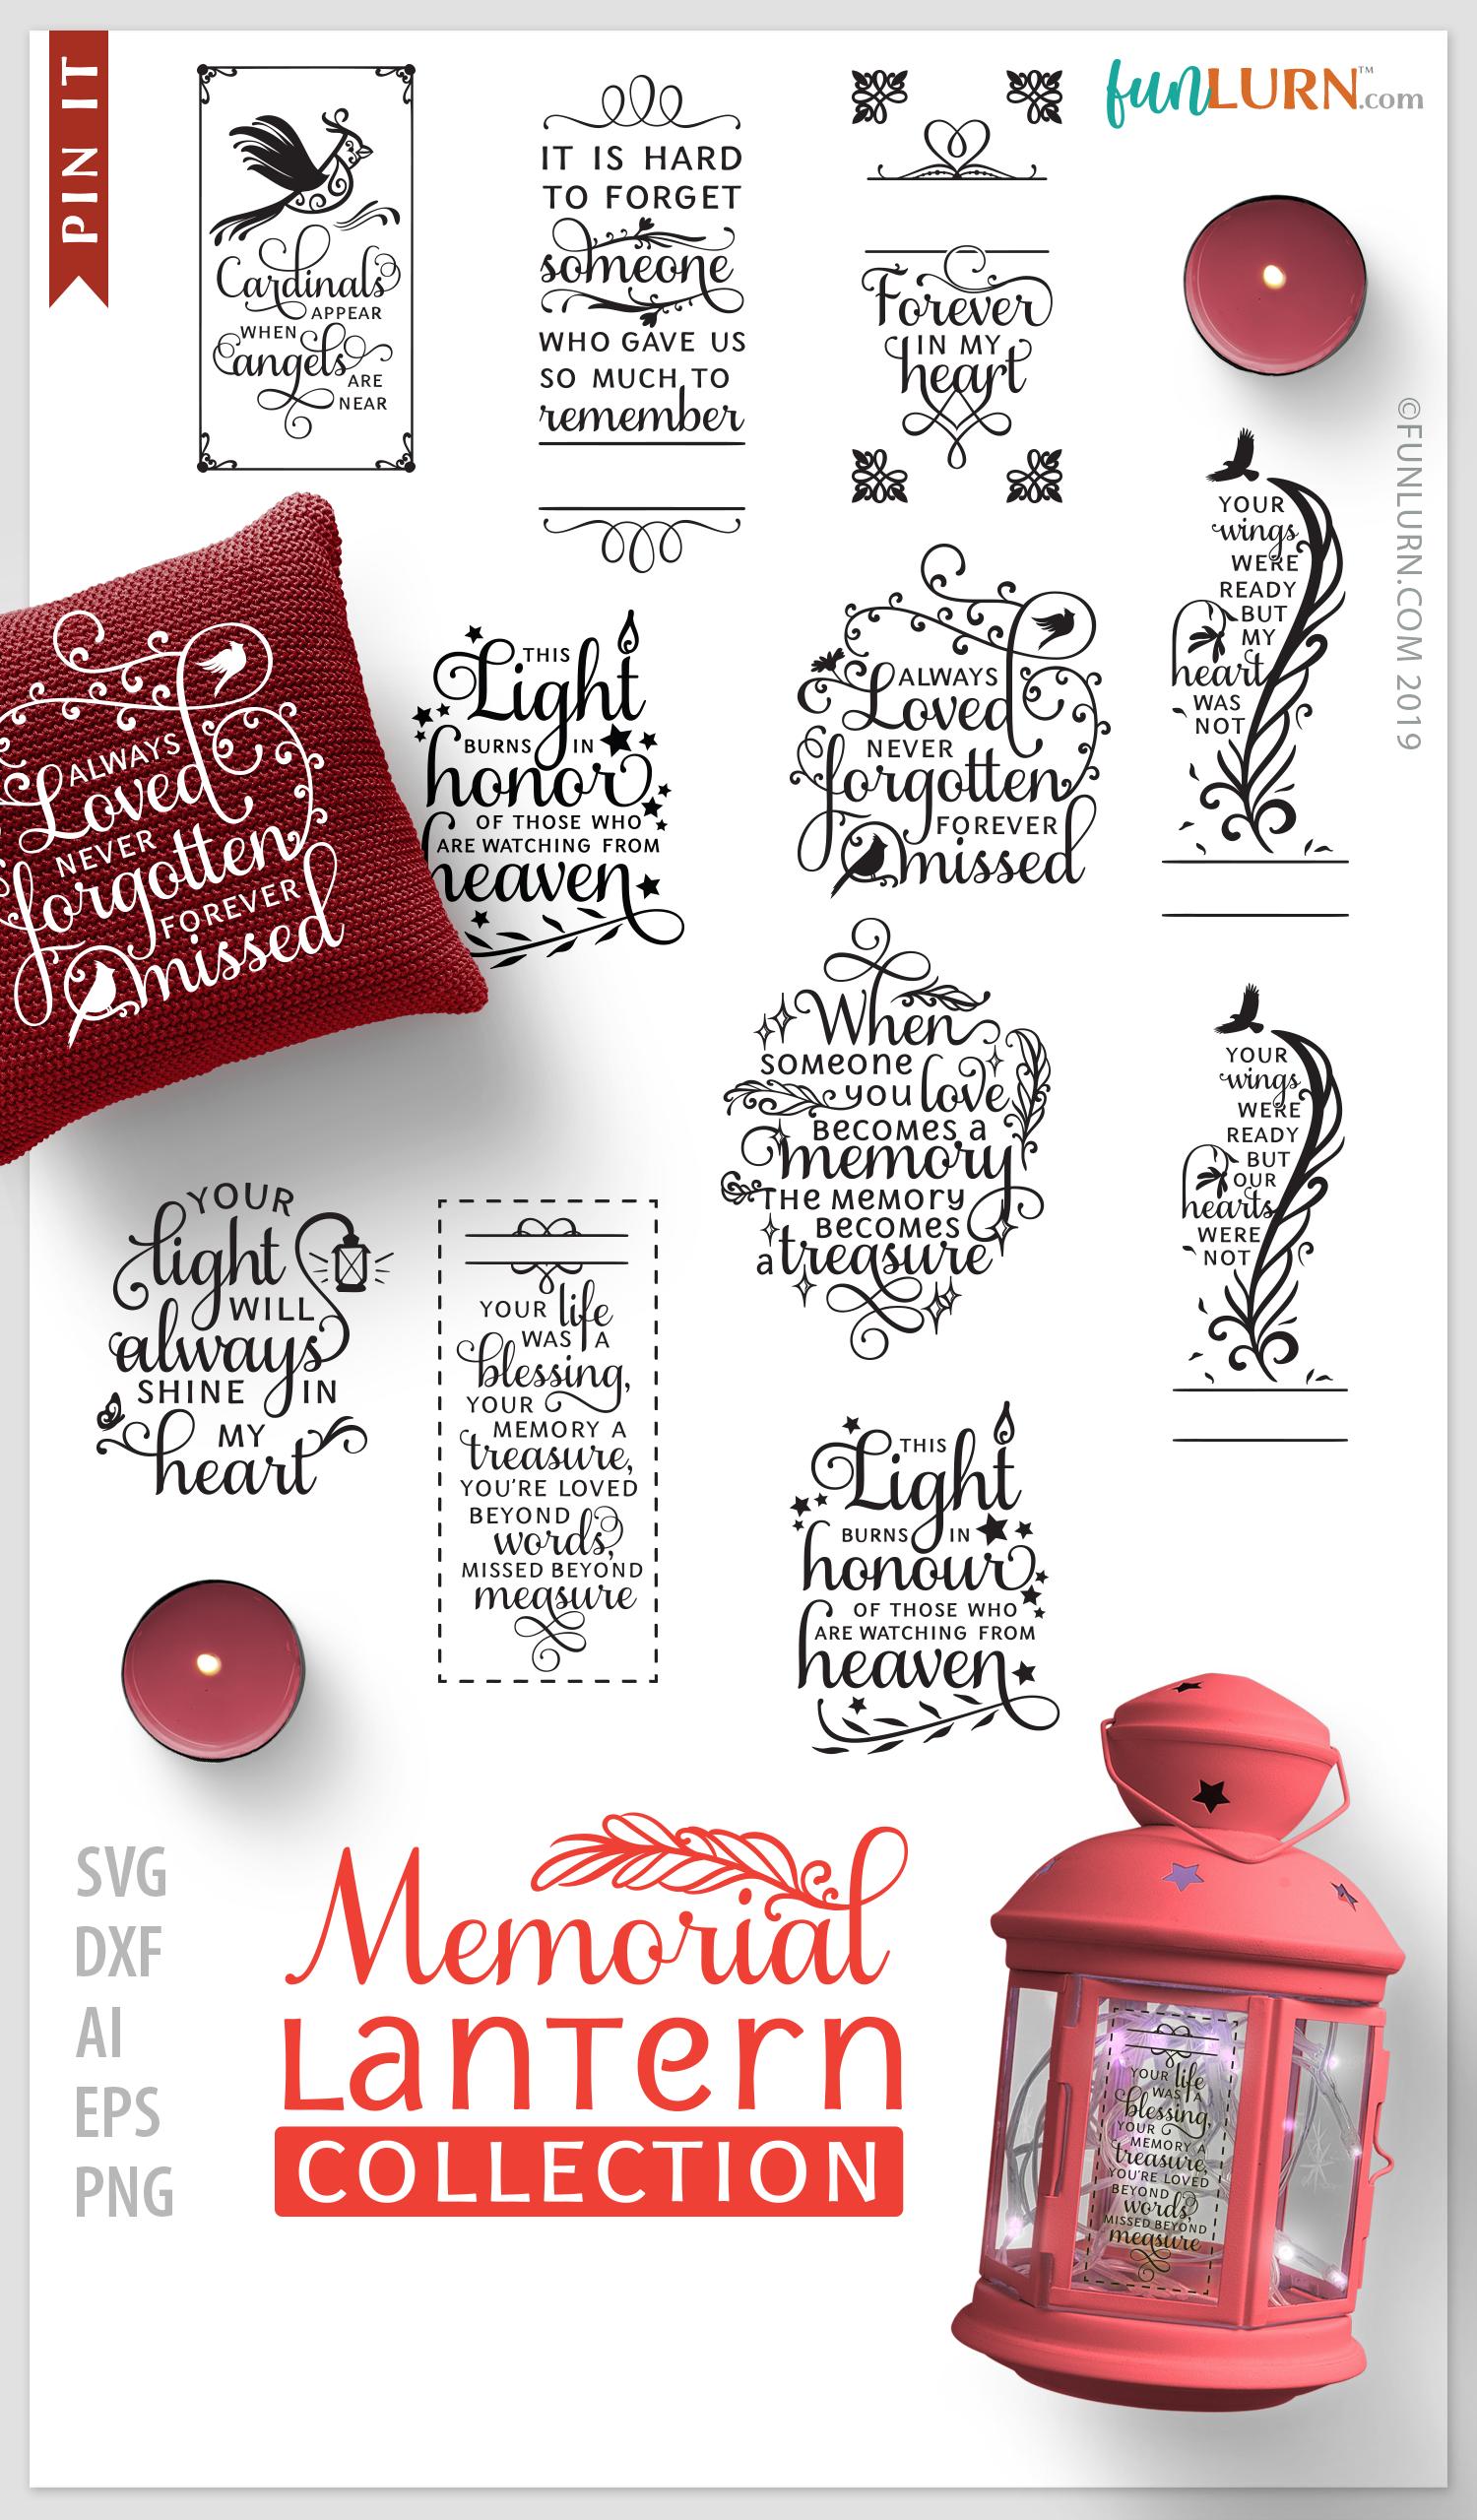 Memorial Lantern Collection Memorial Svg Bundle Funlurn Memorial Lanterns Christmas Lanterns Cricut Crafts